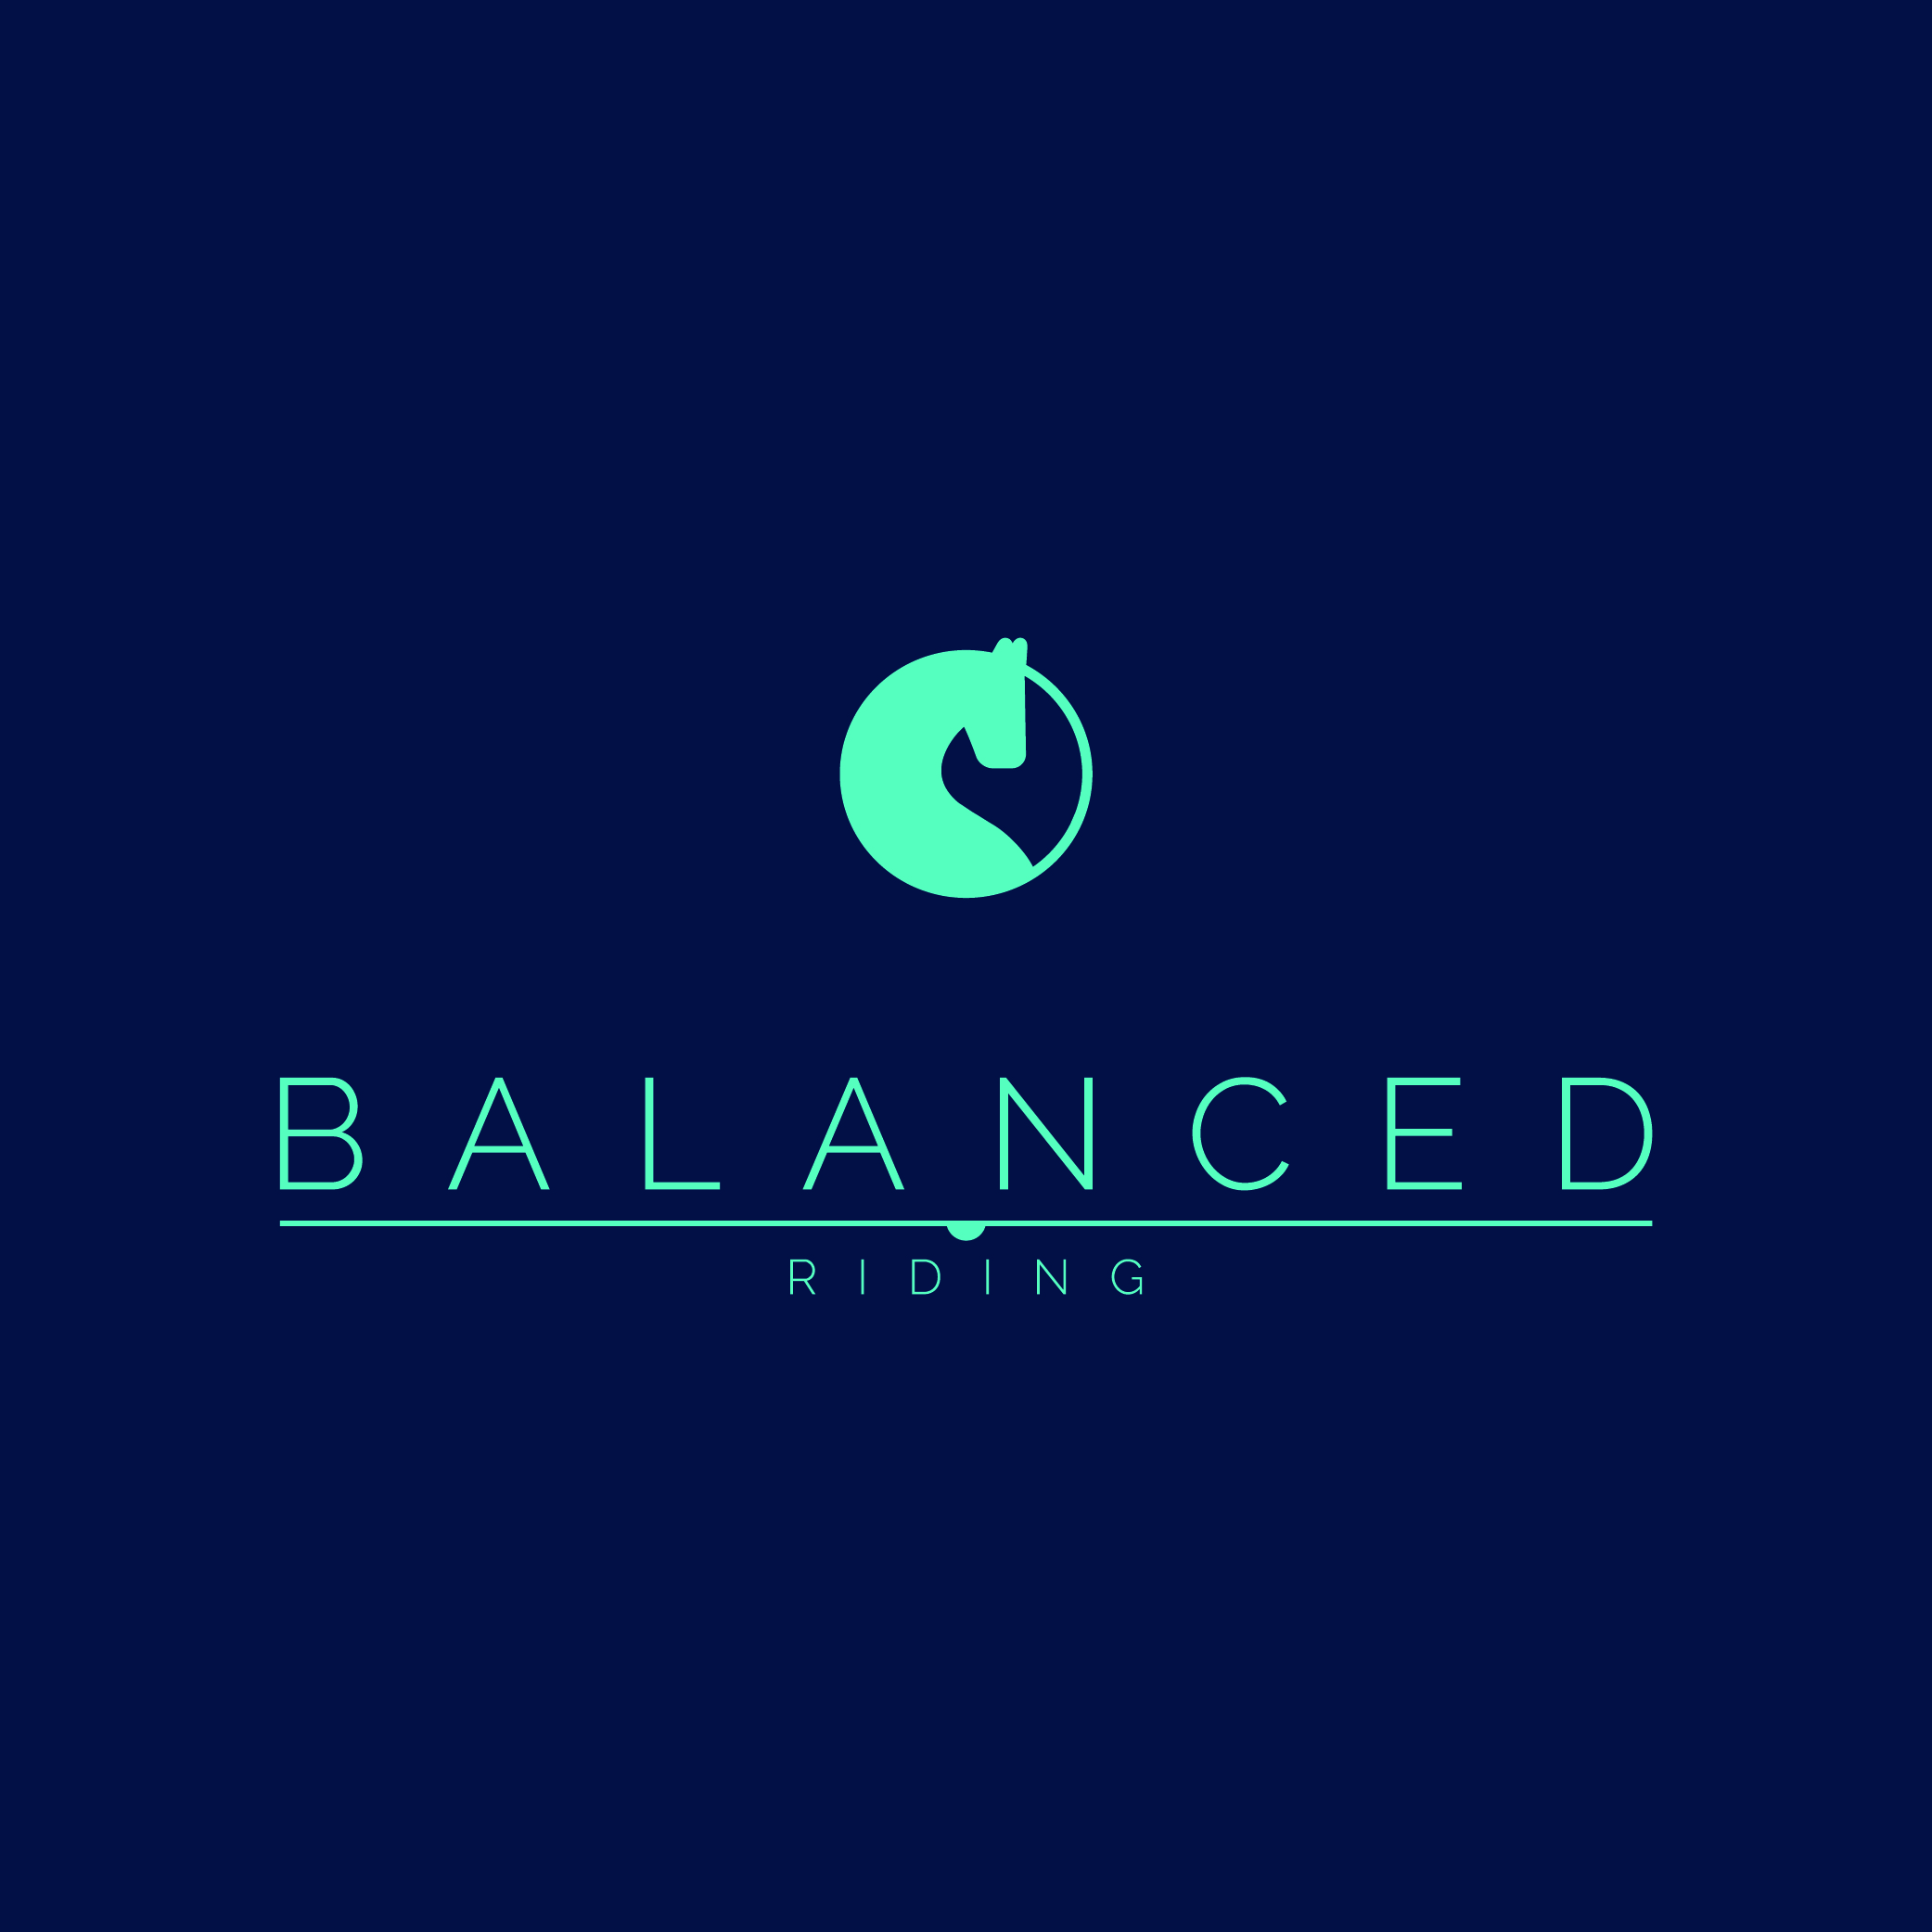 Balanced Riding Final Logo-02.jpg